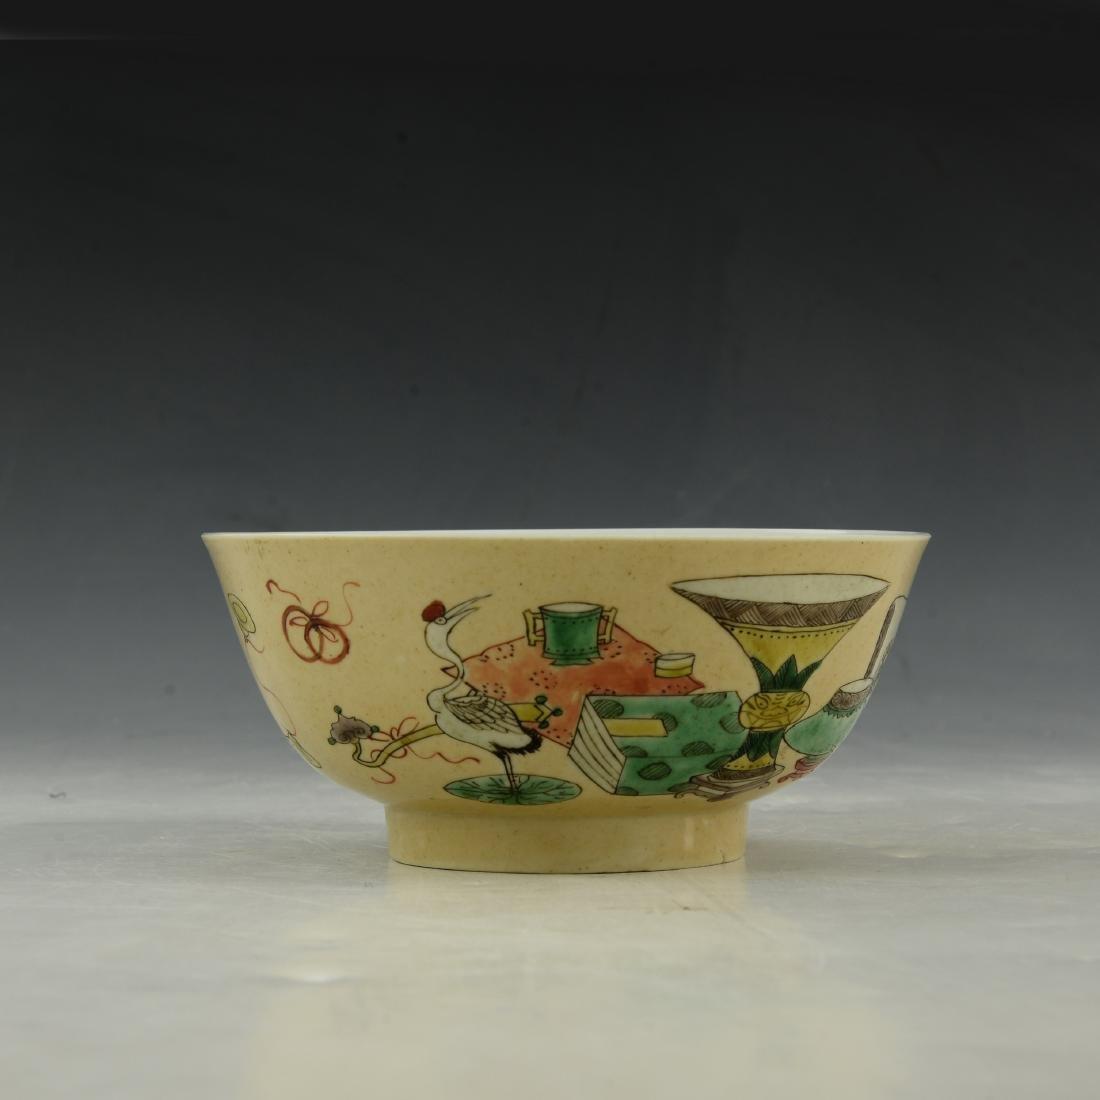 A five-color bowl,Kang Xi period, Qing